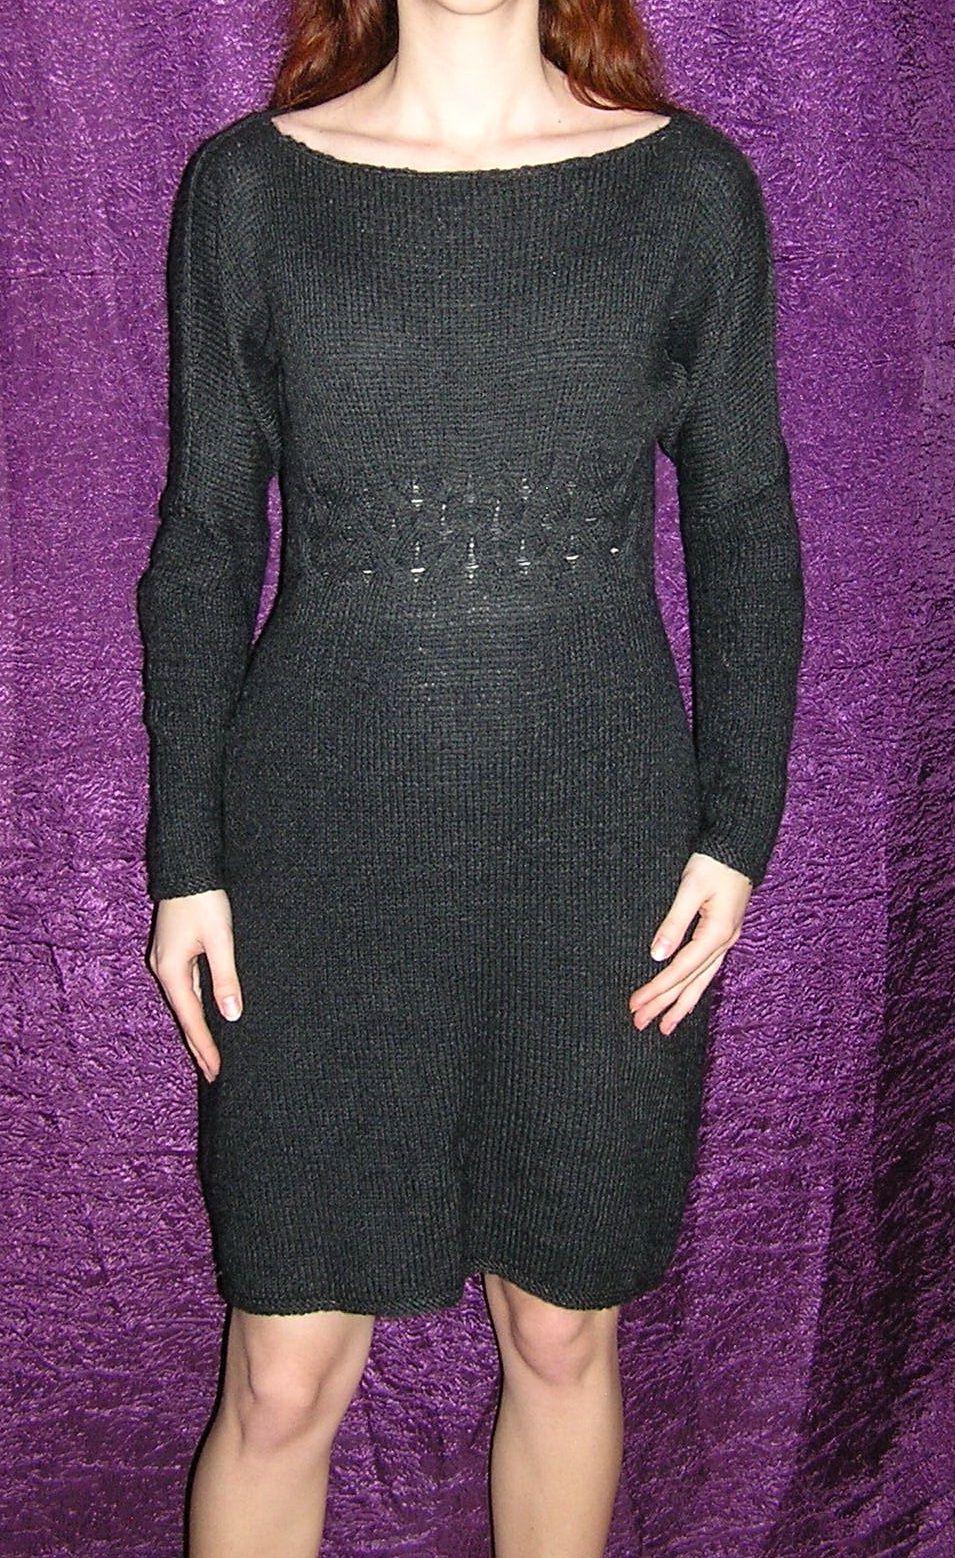 clothes knitting black dress winter